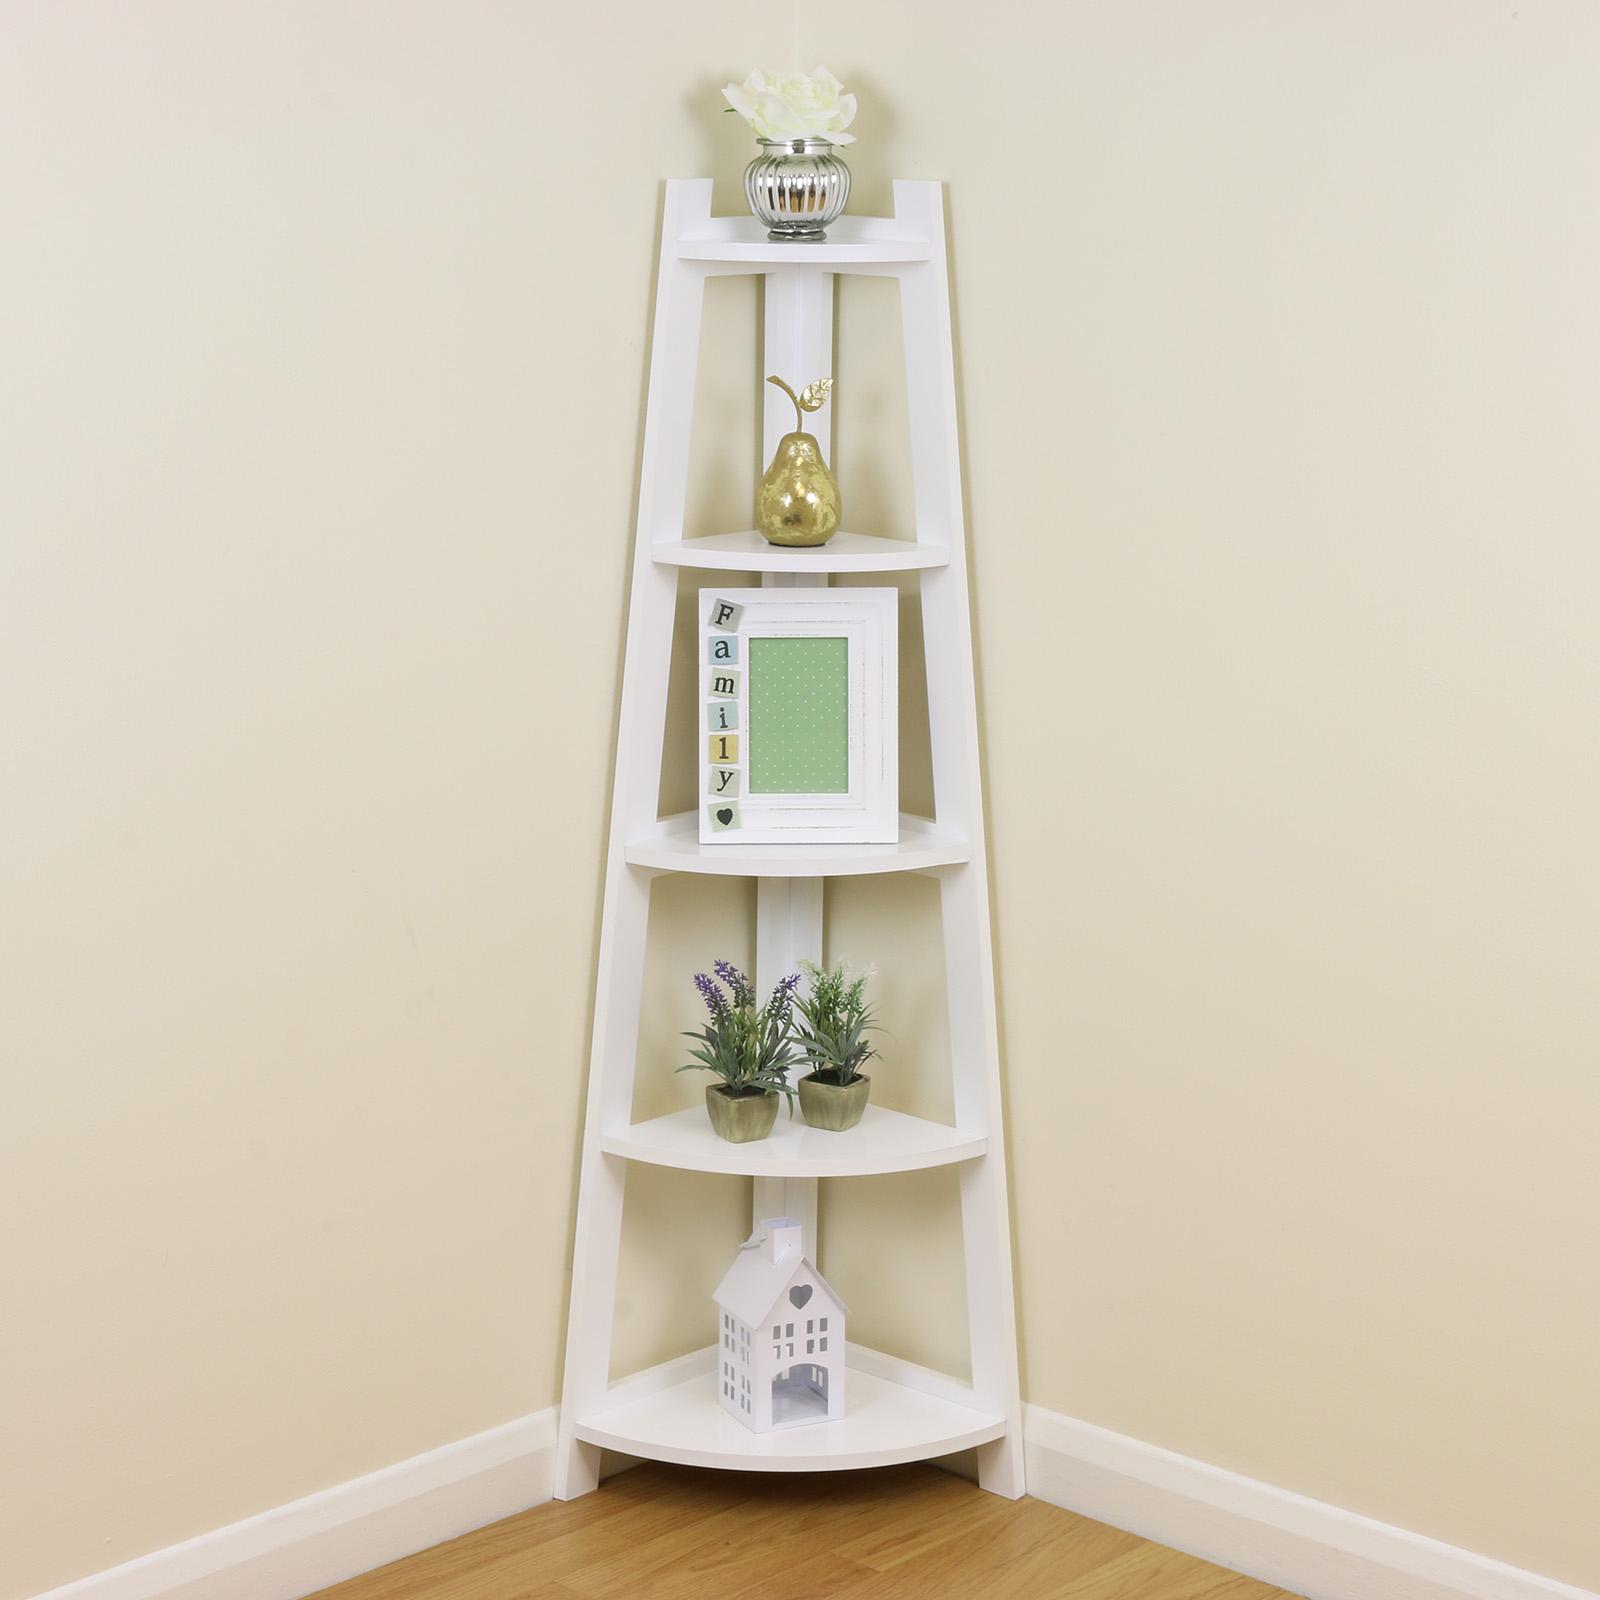 White 5 Tier Corner Shelf/Shelving Unit Stand Home ... on Bathroom Corner Shelf  id=67929